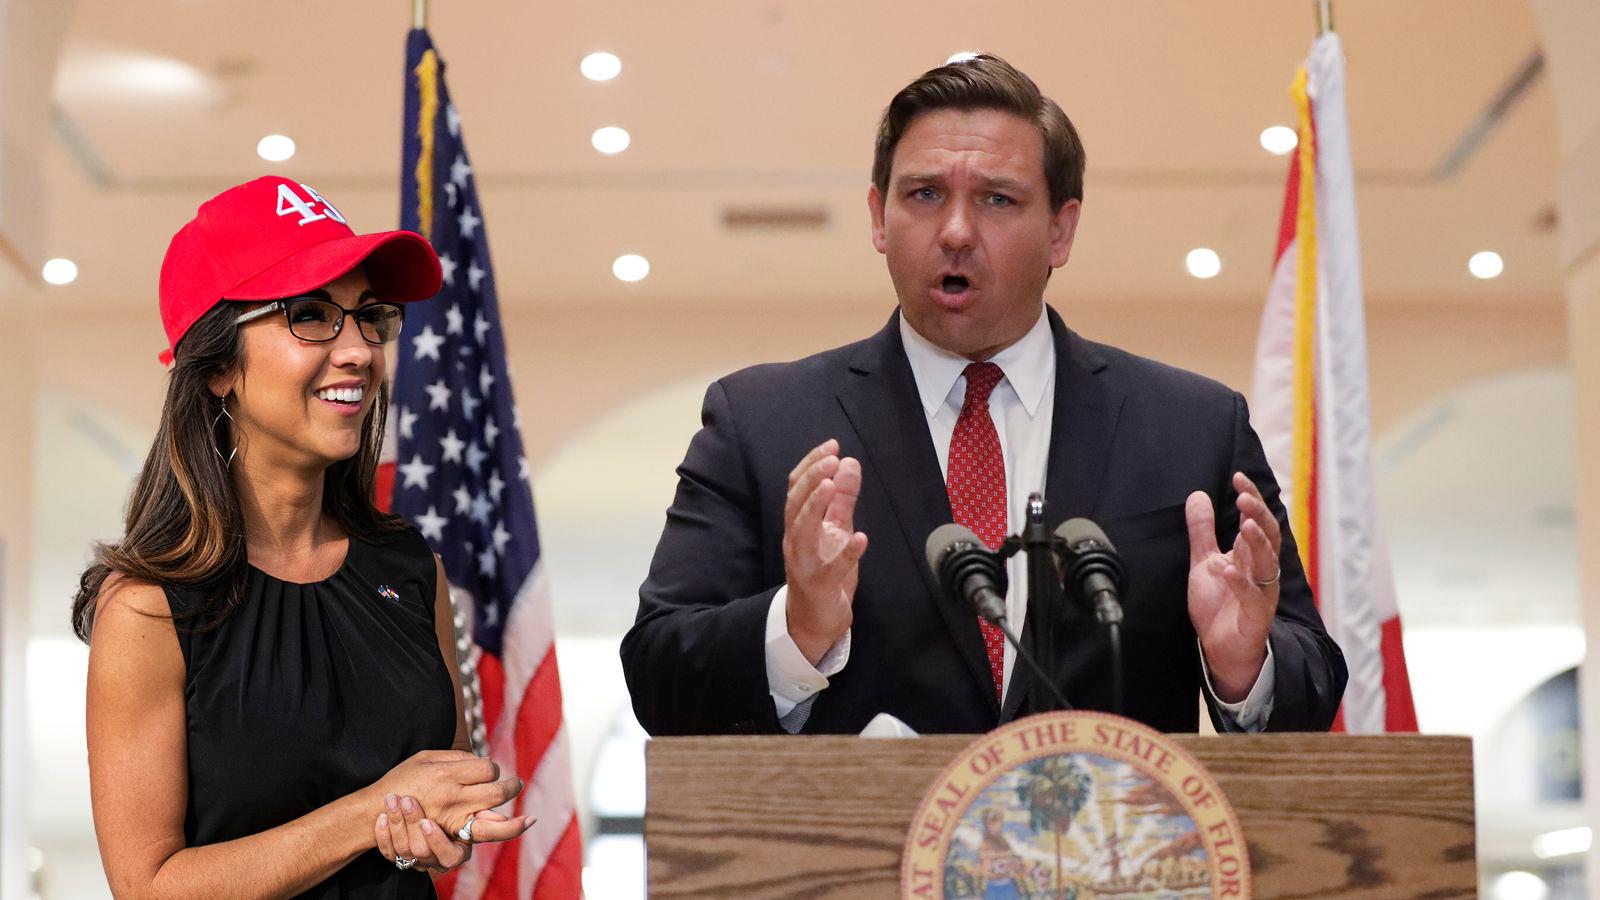 Governor Ron DeSantis and U.S. Rep Lauren Boebert